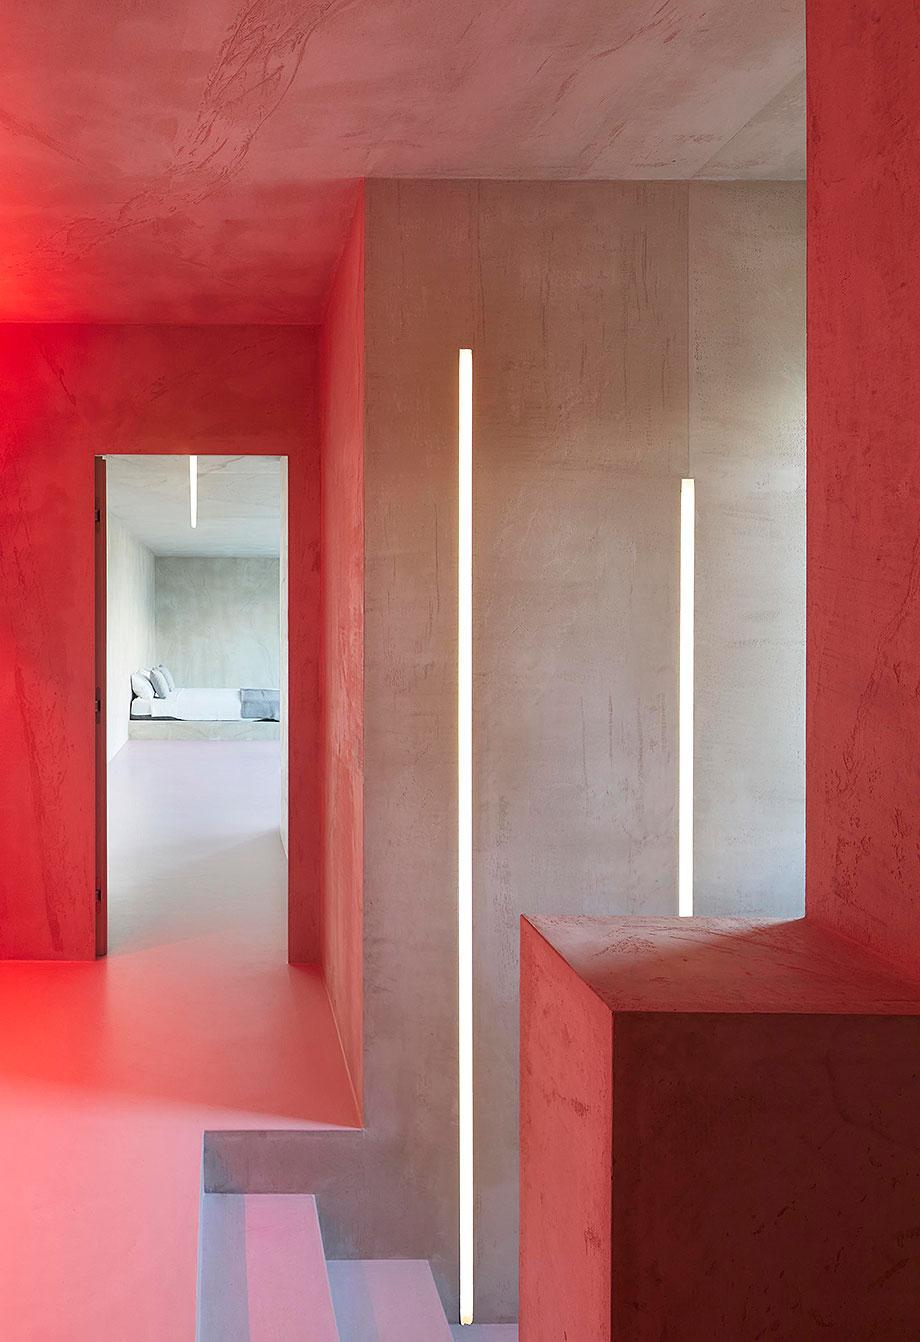 camaleonica vivienda en ibiza por minimal studio (12) - foto art sanchez photography